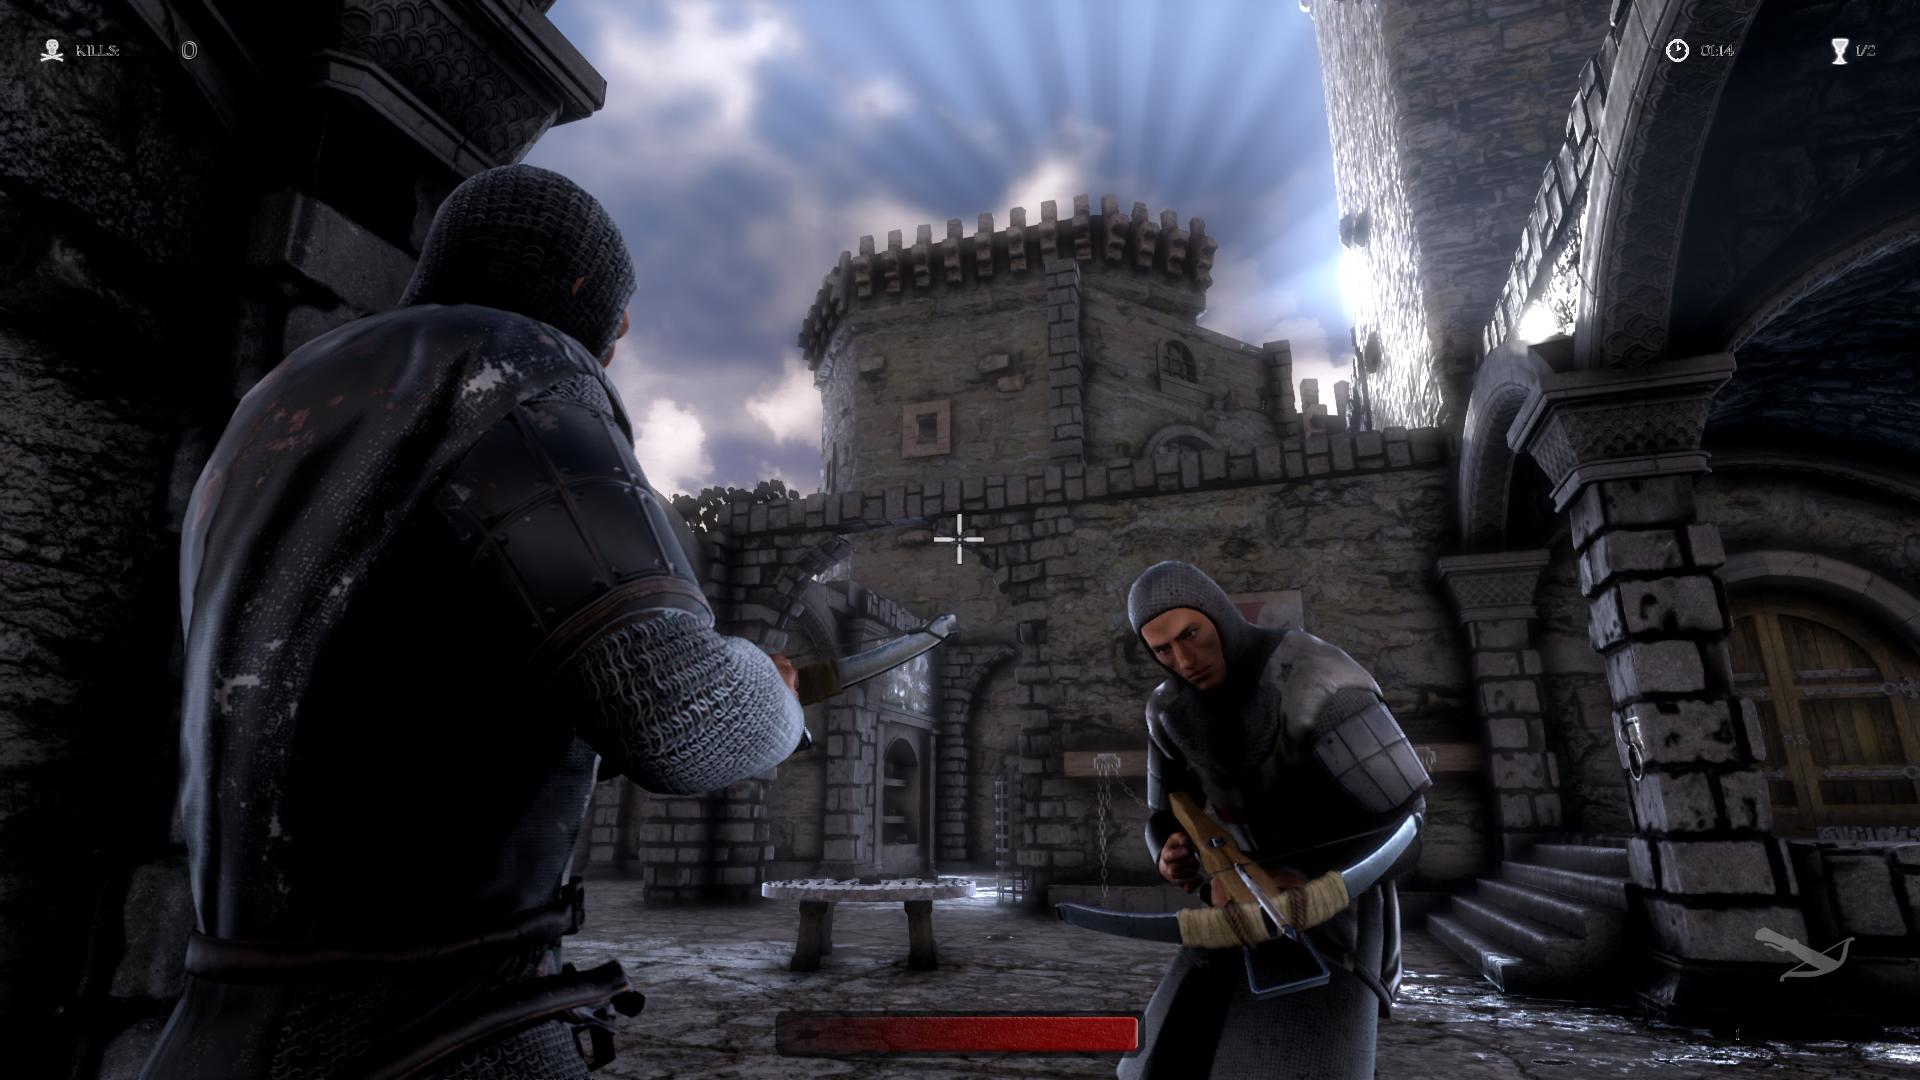 Templars Screenshot 2020 05 15 1